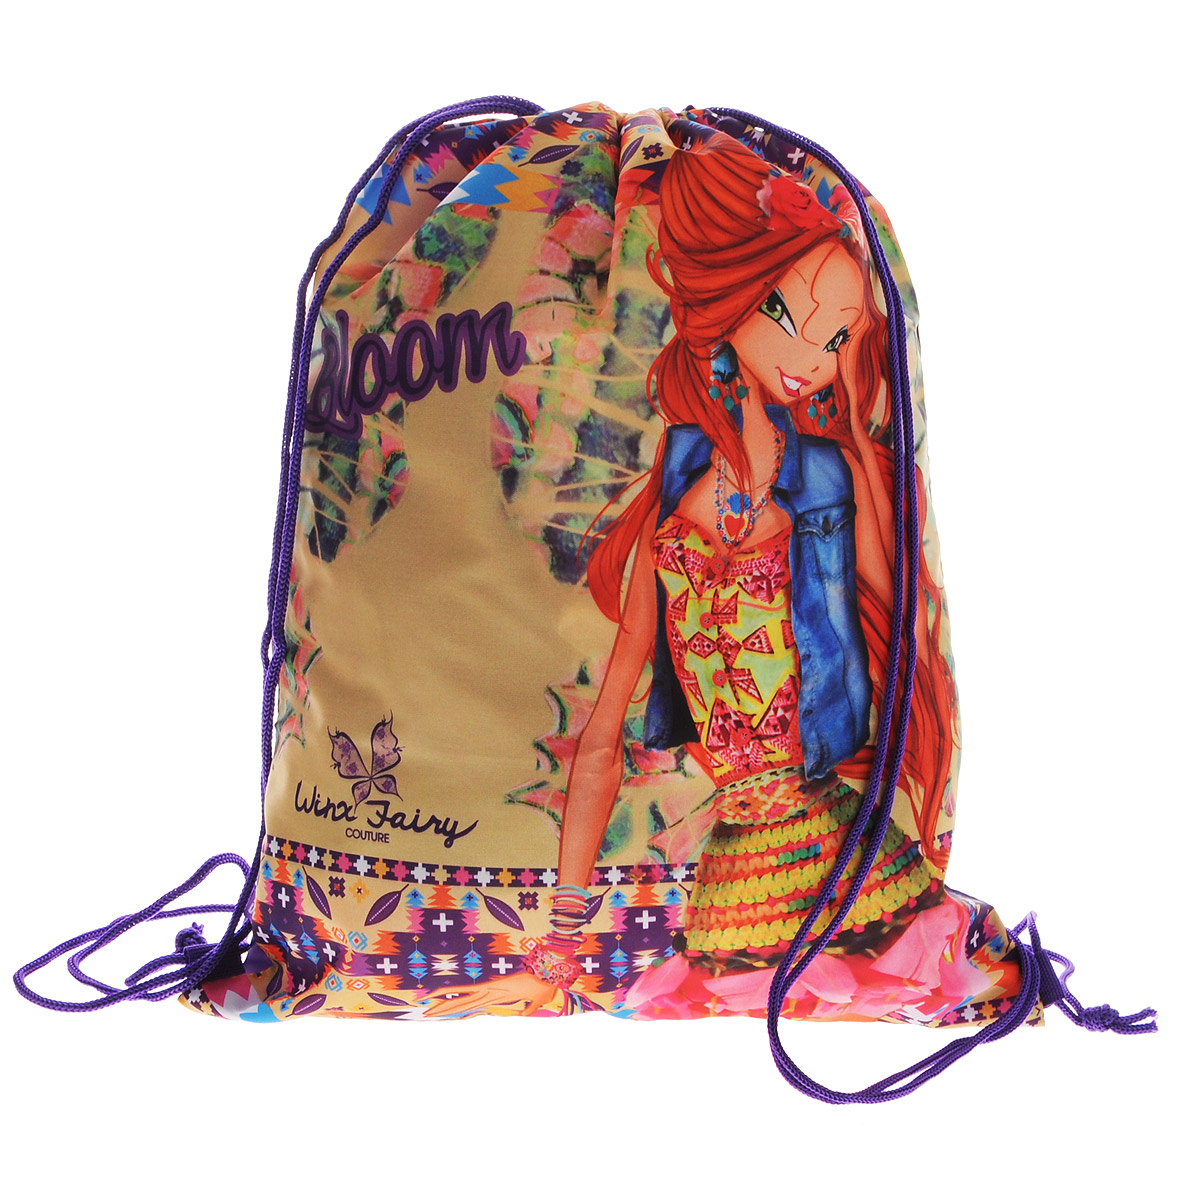 цена Winx Club Сумка-рюкзак для обуви Winx Fairy Couture цвет фиолетовый WXCB-UT1-883 онлайн в 2017 году